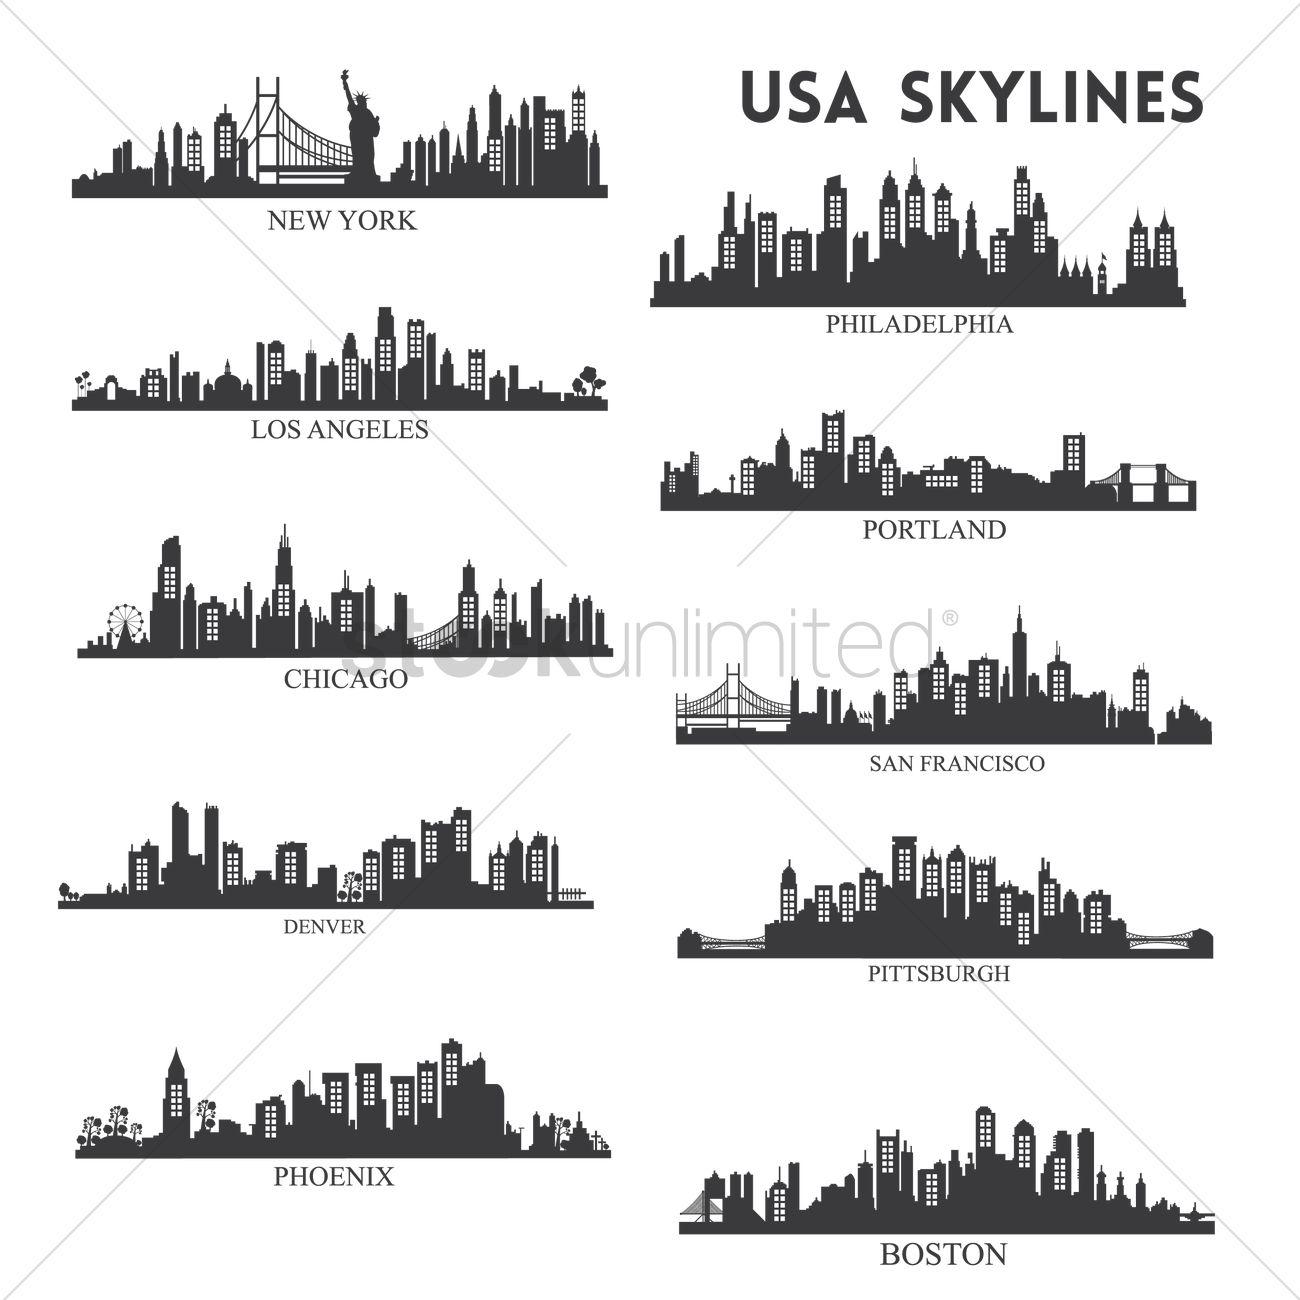 usa skyline silhouette collection vector image 1515593